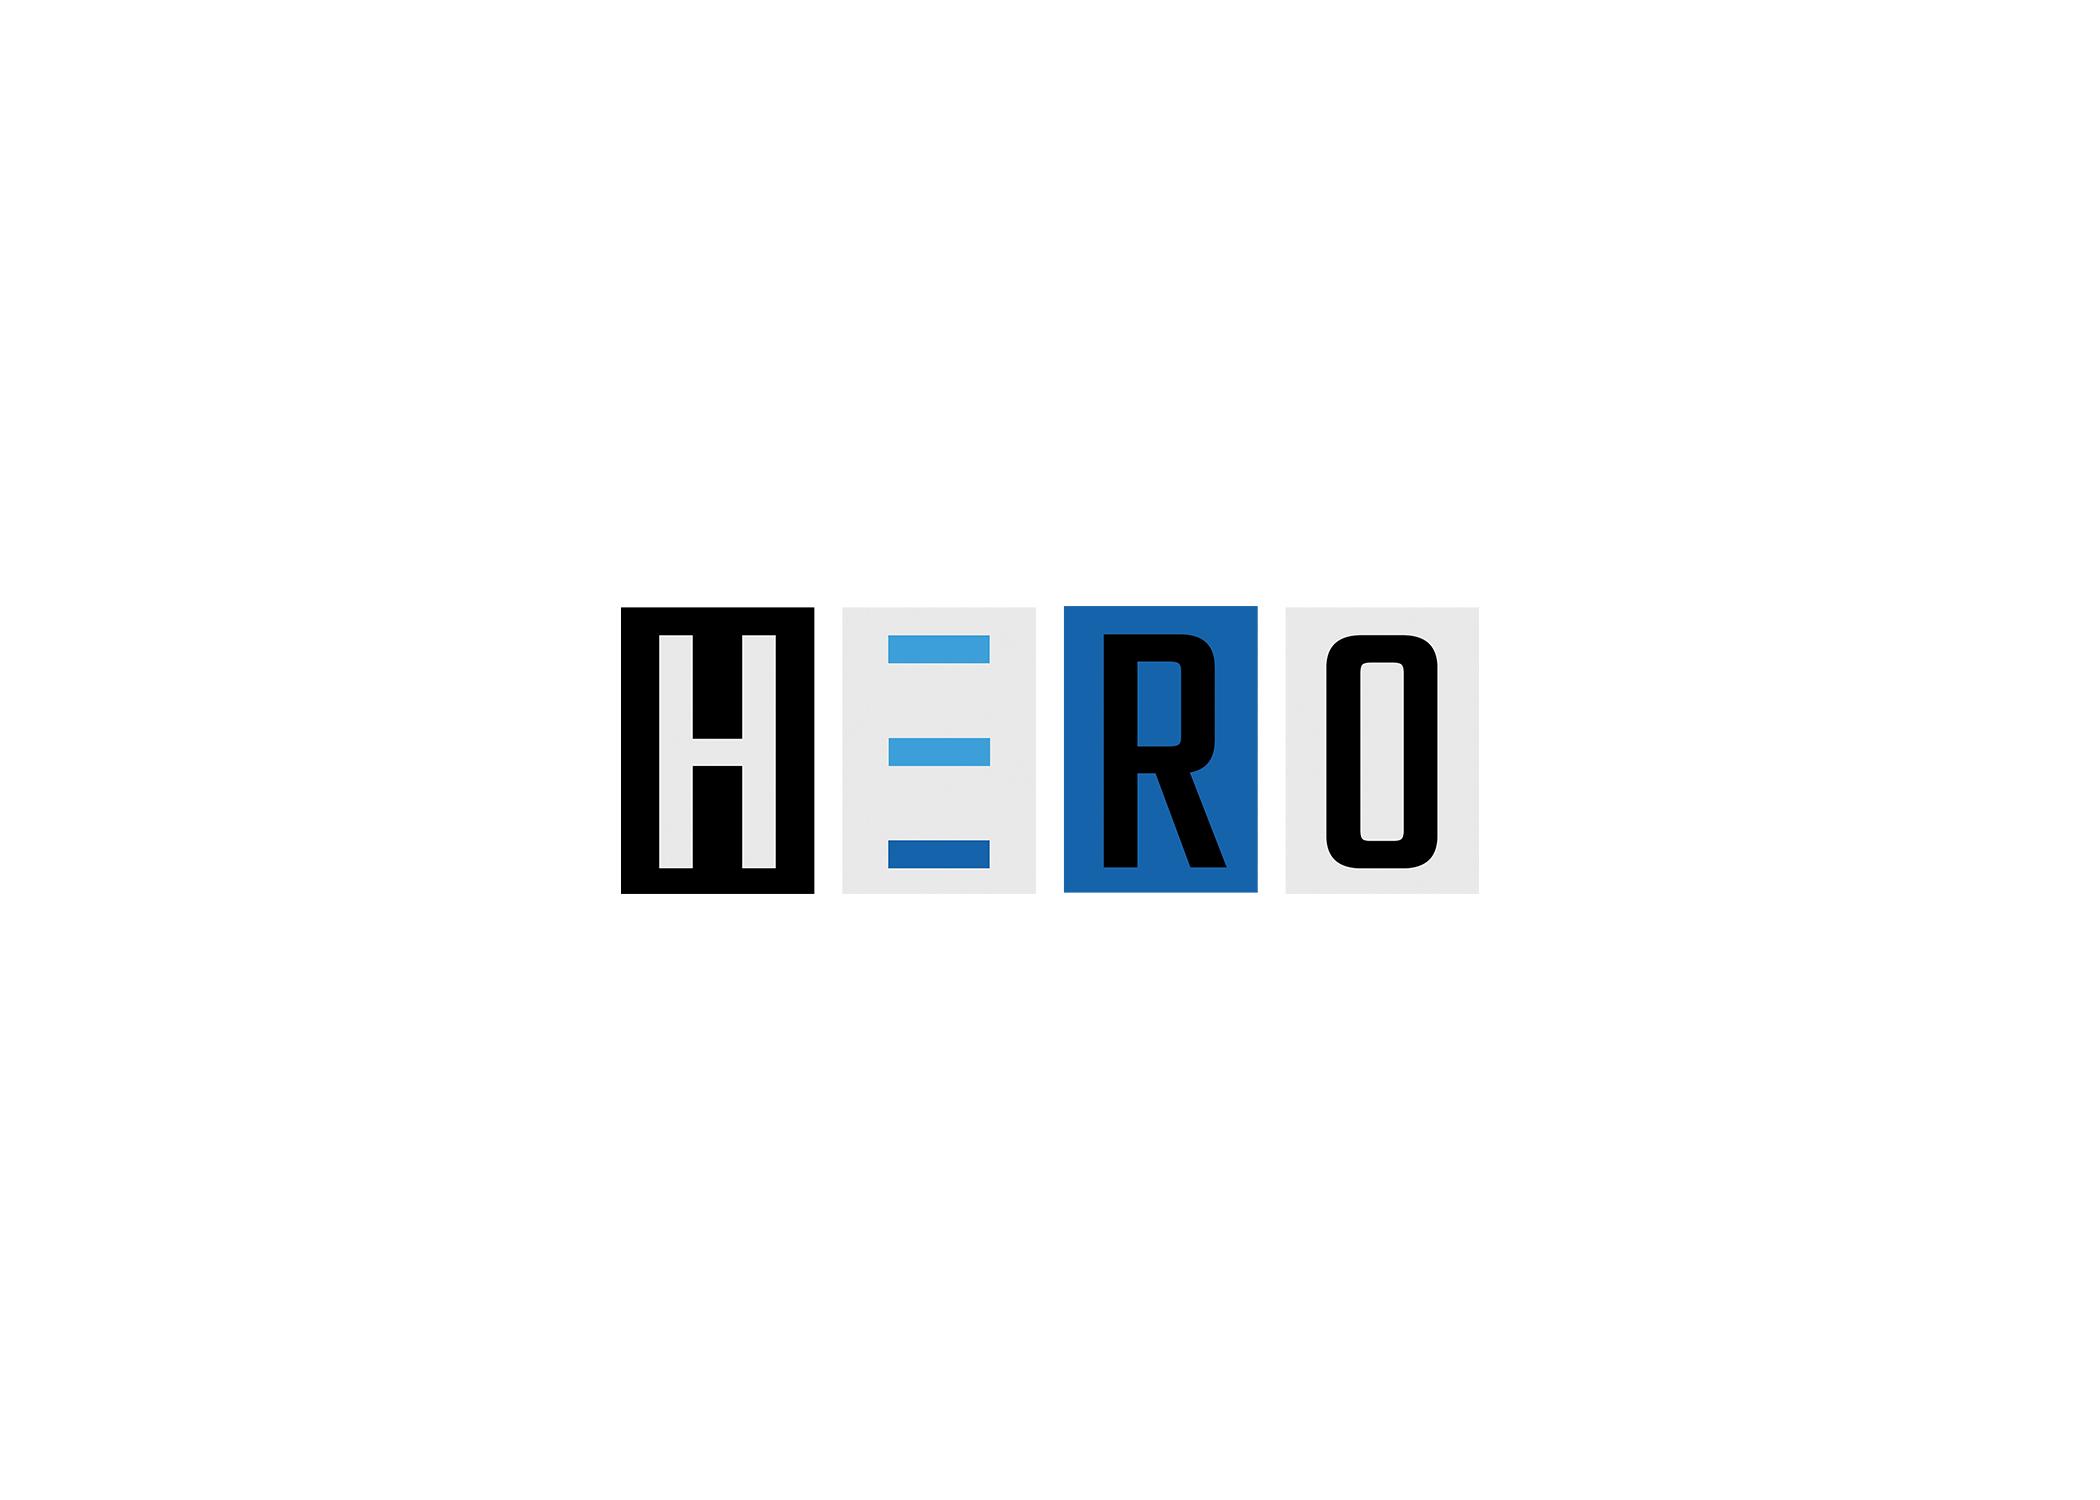 herologo.jpg